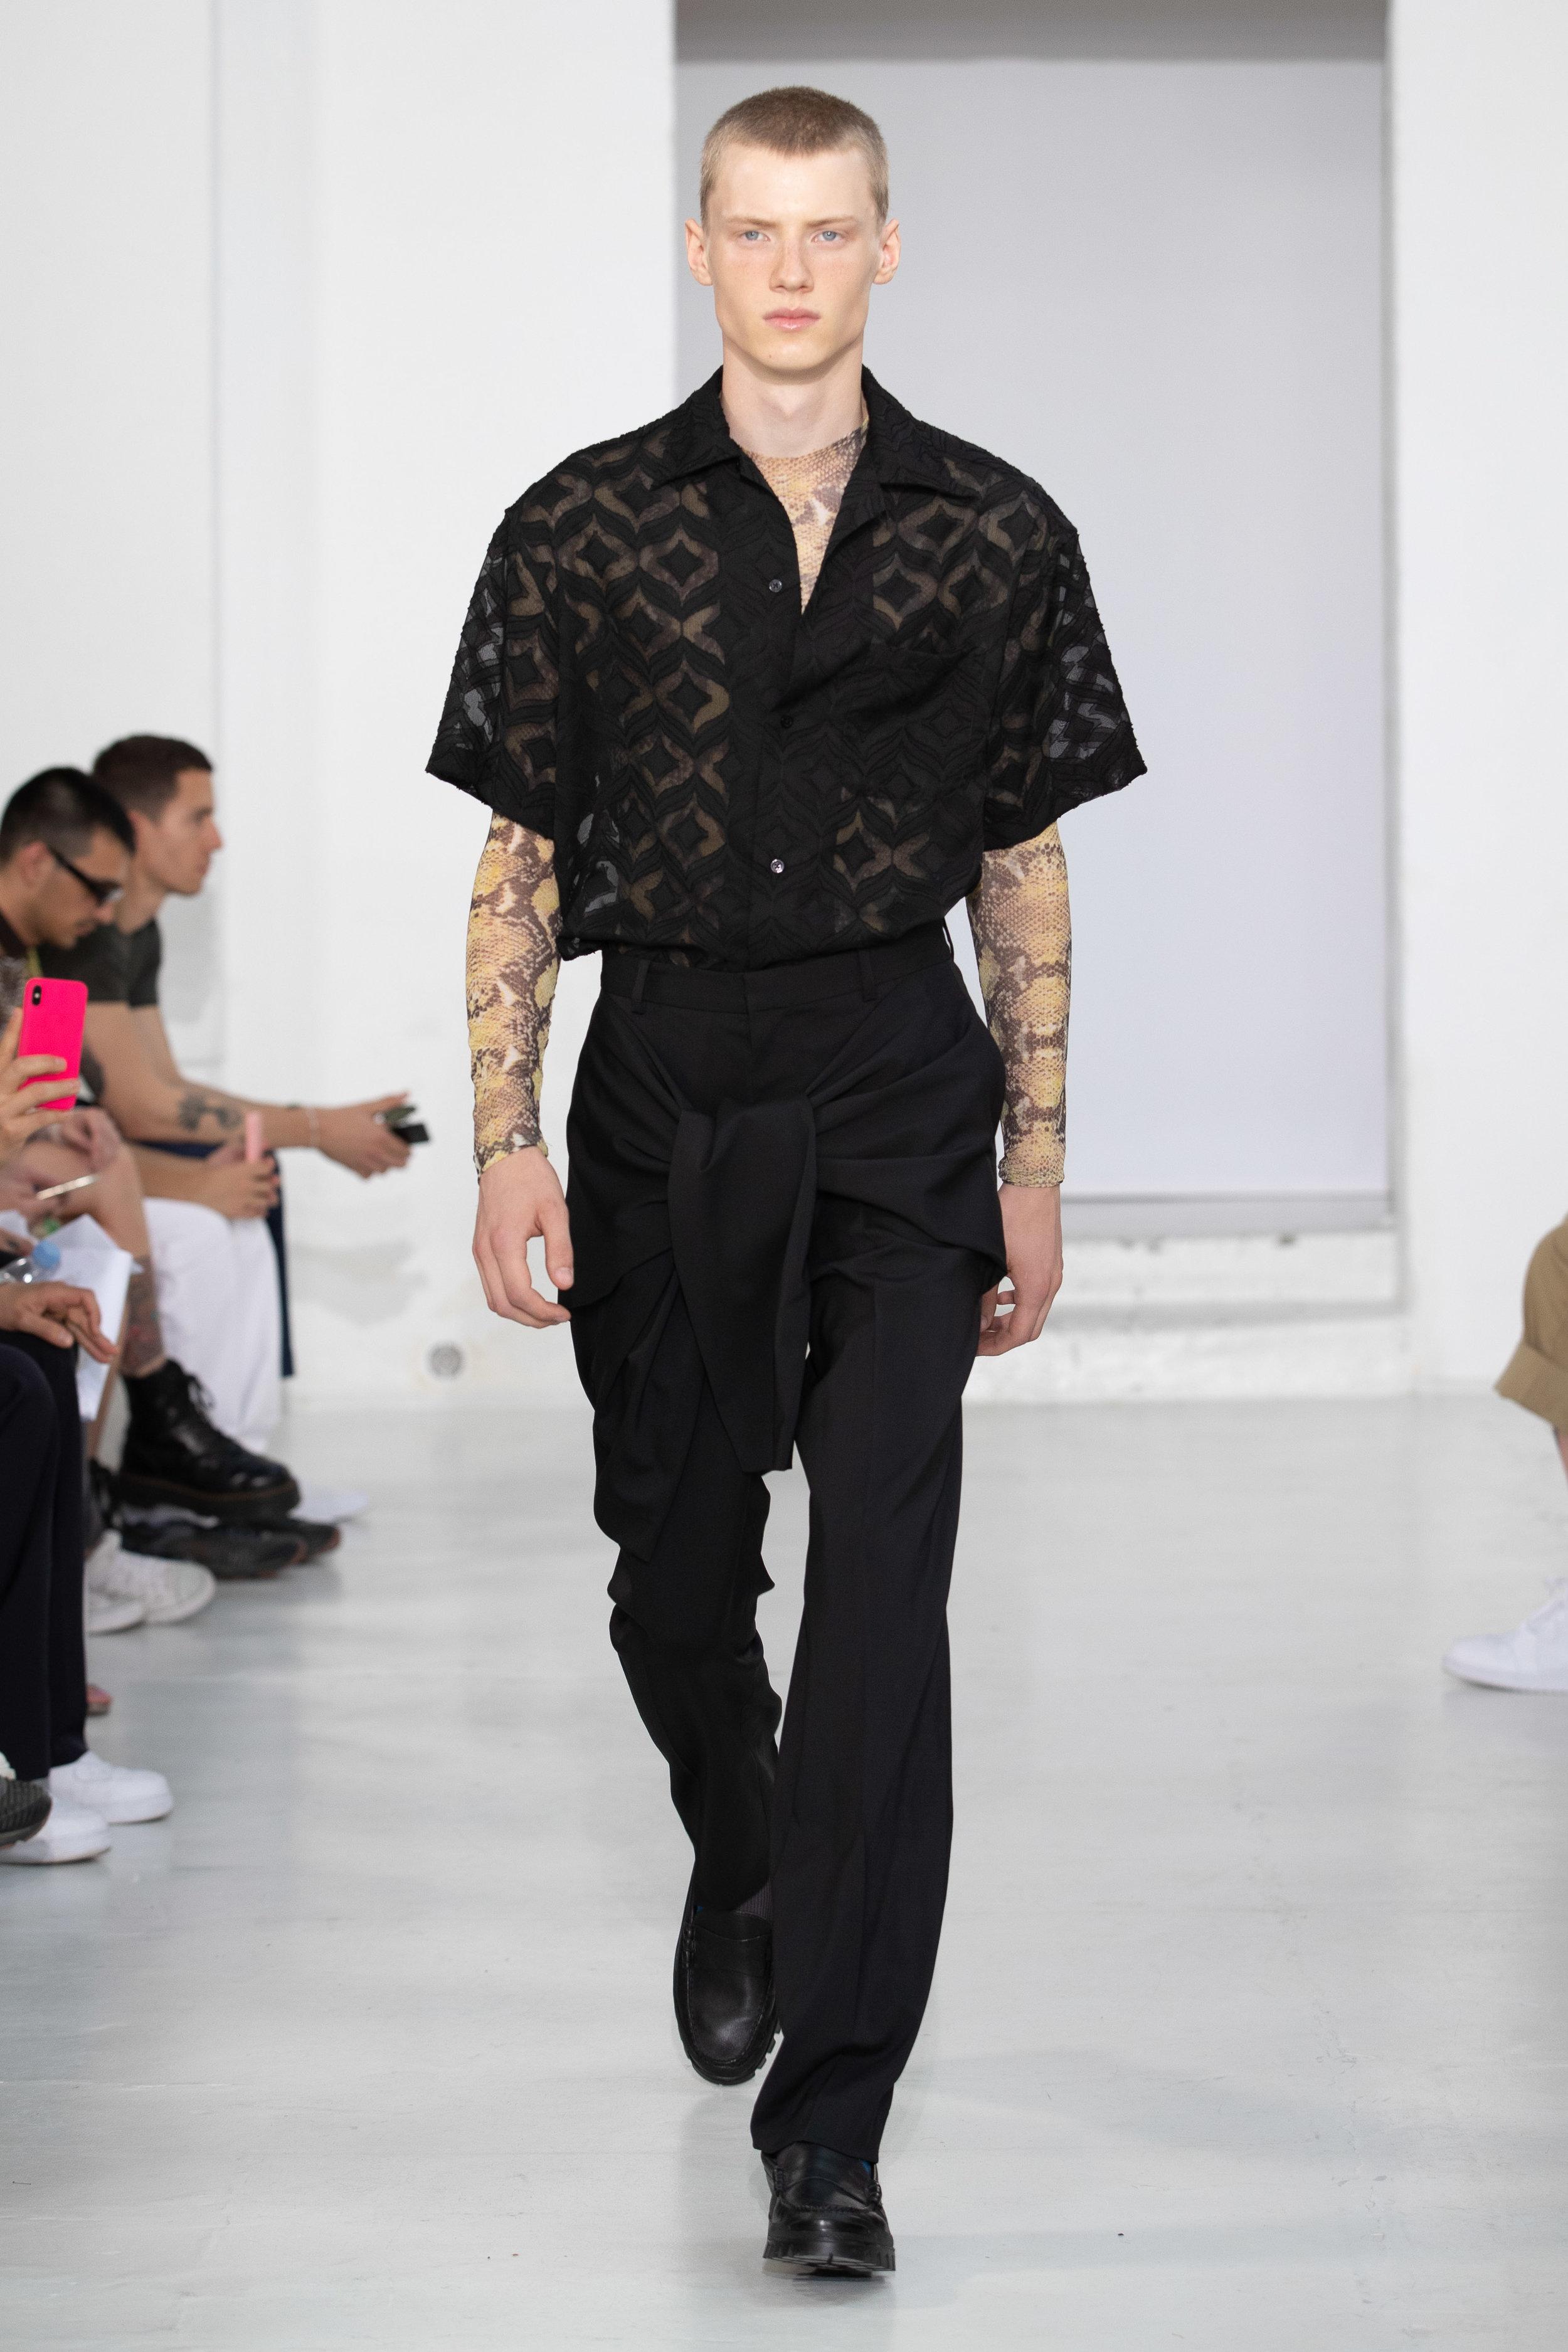 Ellia Art Gallery, Rue de Turenne, Paris, France. 18th June 2019. CMMN SWDN show their Spring Summer 2020 designs at their catwalk show during Paris Fashion Week Mens 2020. ©Chris Yates